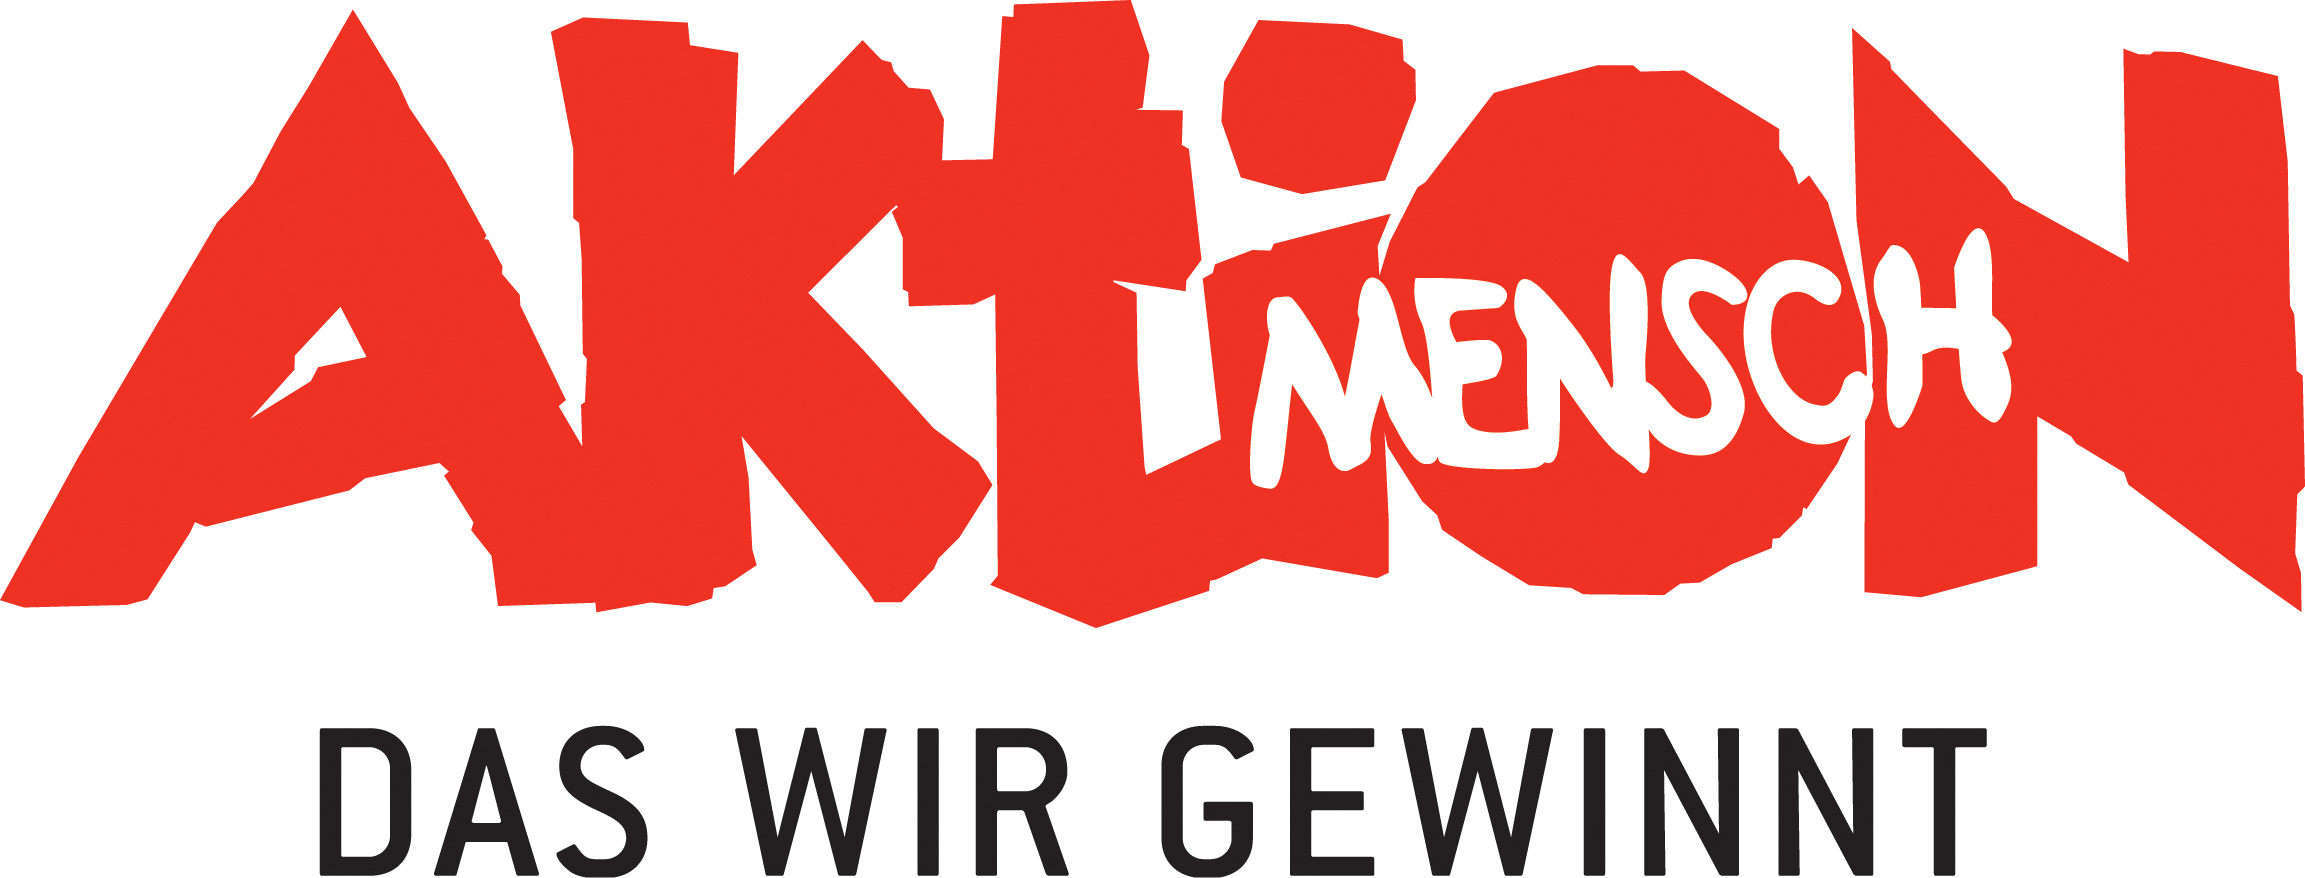 Logo_aktion mensch